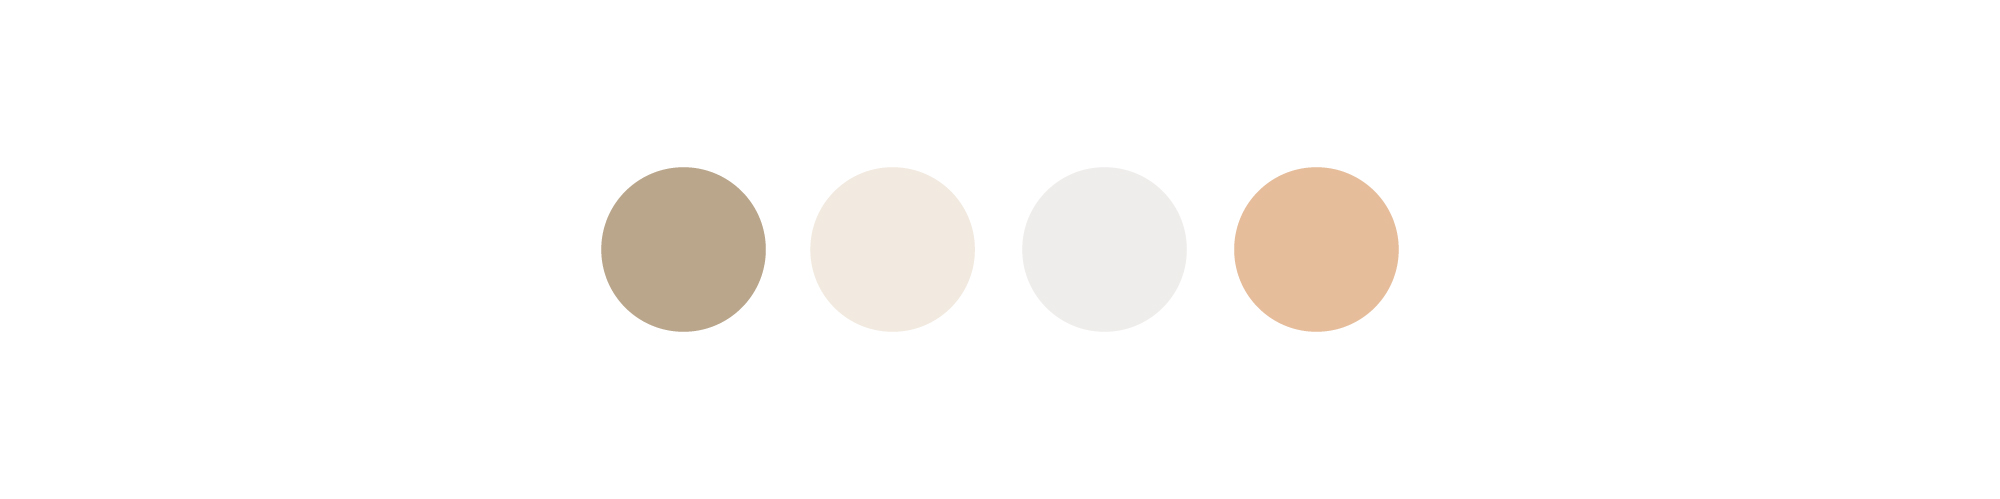 Meristem-Colors.jpg